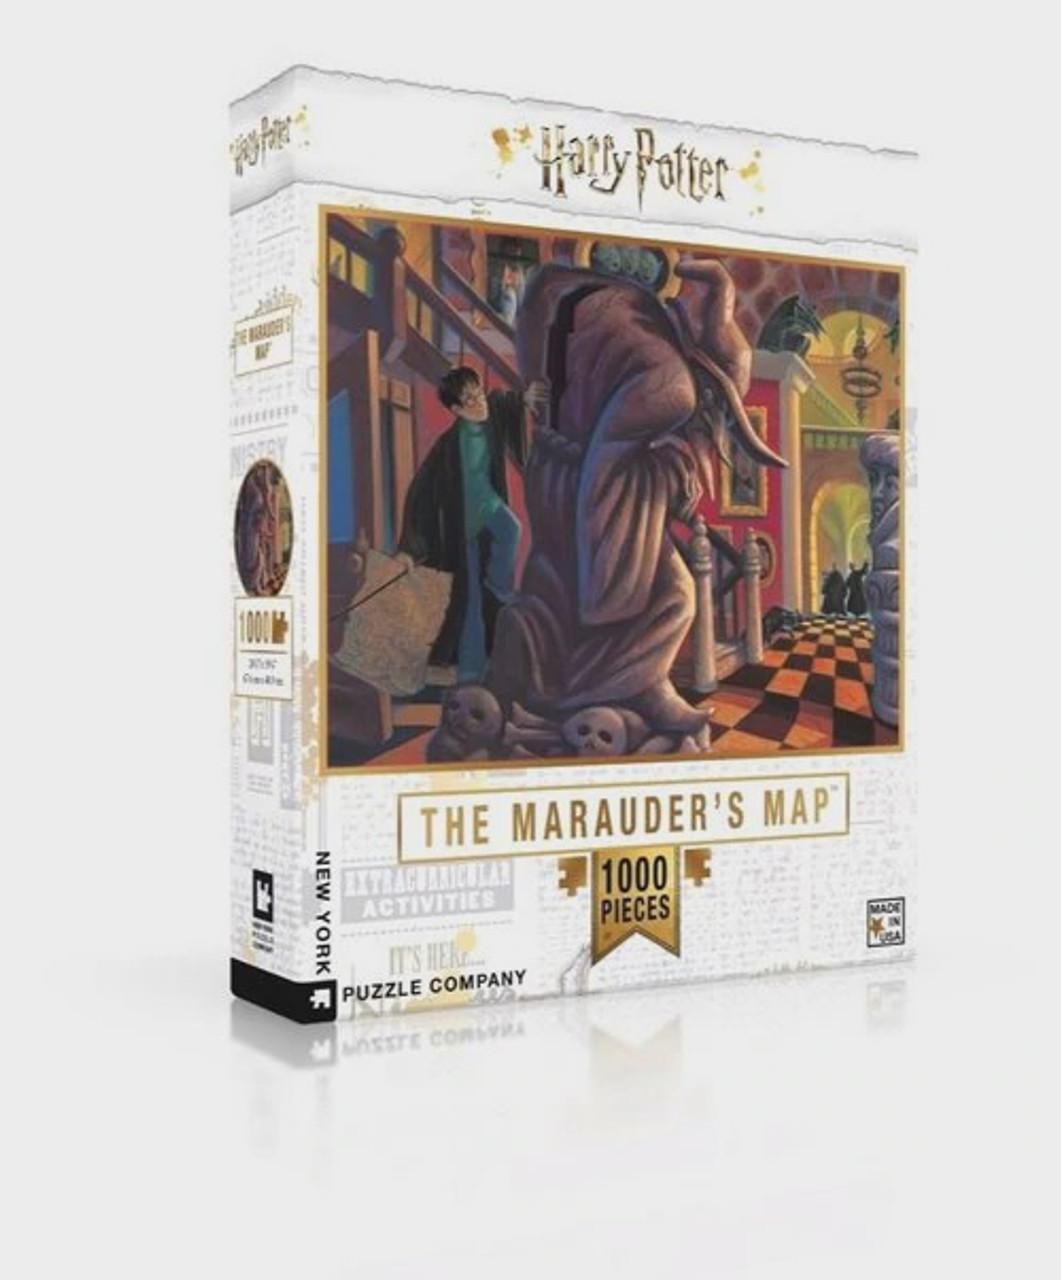 HARRY POTTER THE MARAUDER'S MAP 1000 PCS